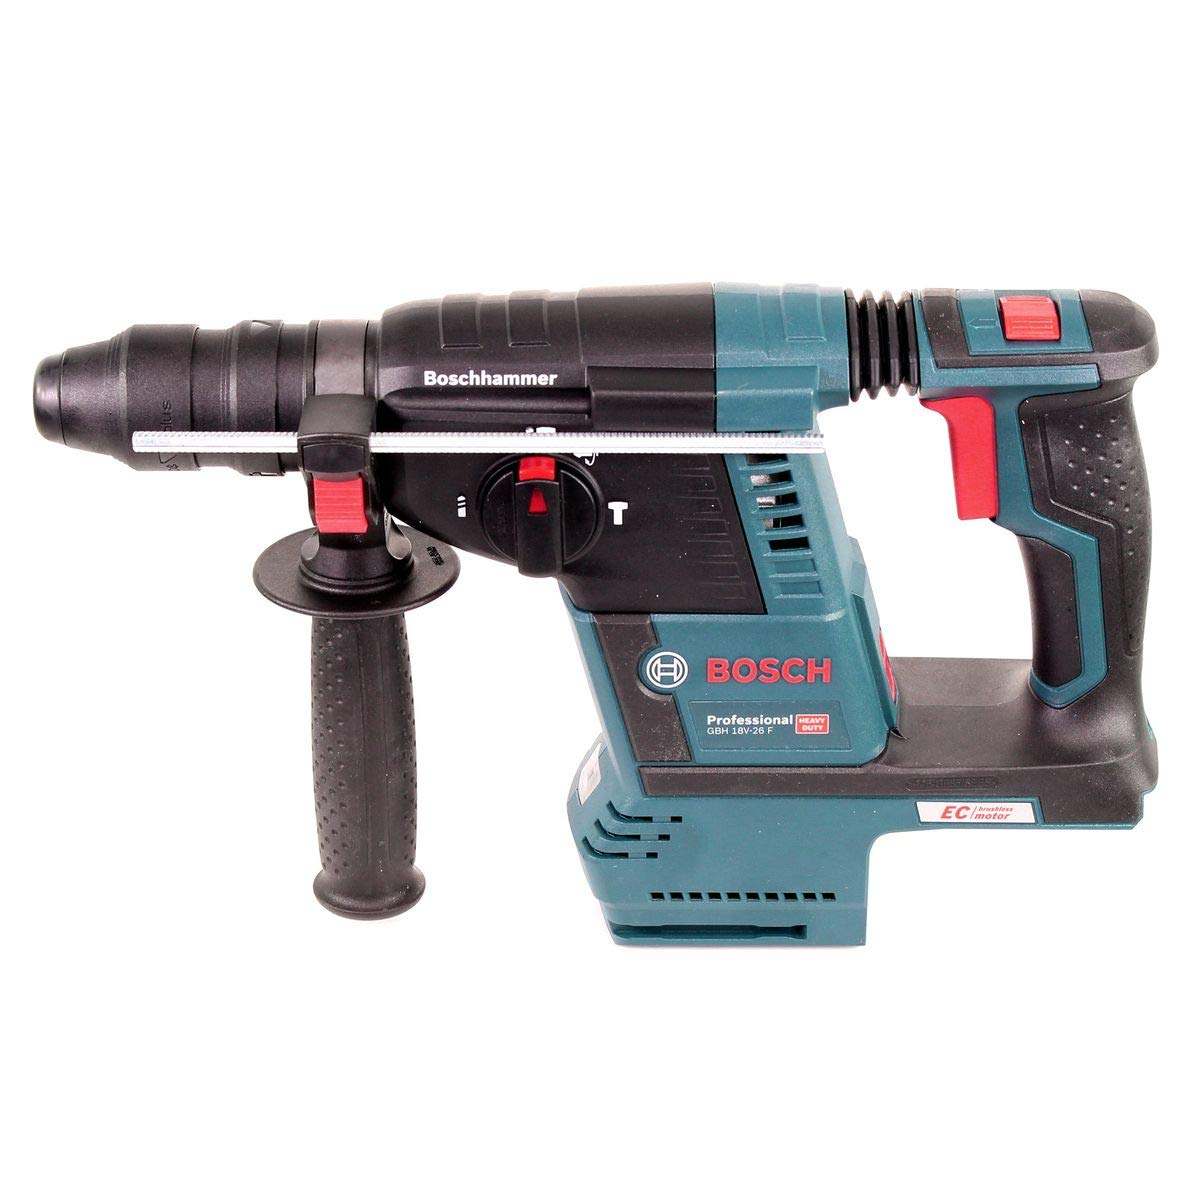 Azul Bosch Professional 0611909000 Bosch Profesional Taladro Martillo perforador GBH 18/V-26/Tijera / 18 V /Caja sin bater/ía y Cargador